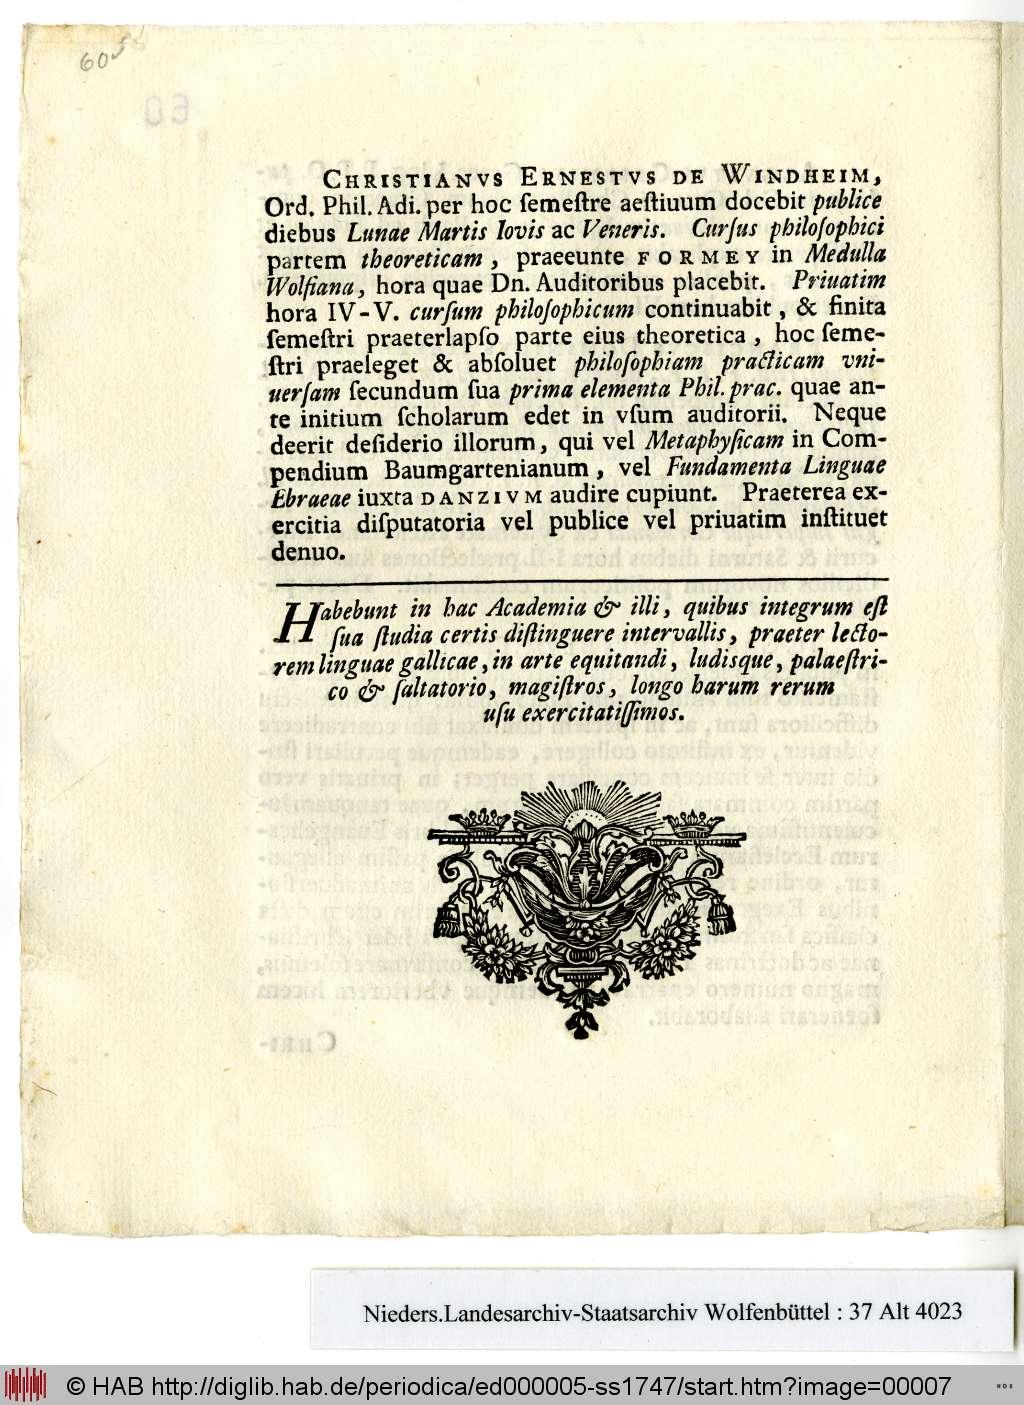 http://diglib.hab.de/periodica/ed000005-ss1747/00007.jpg